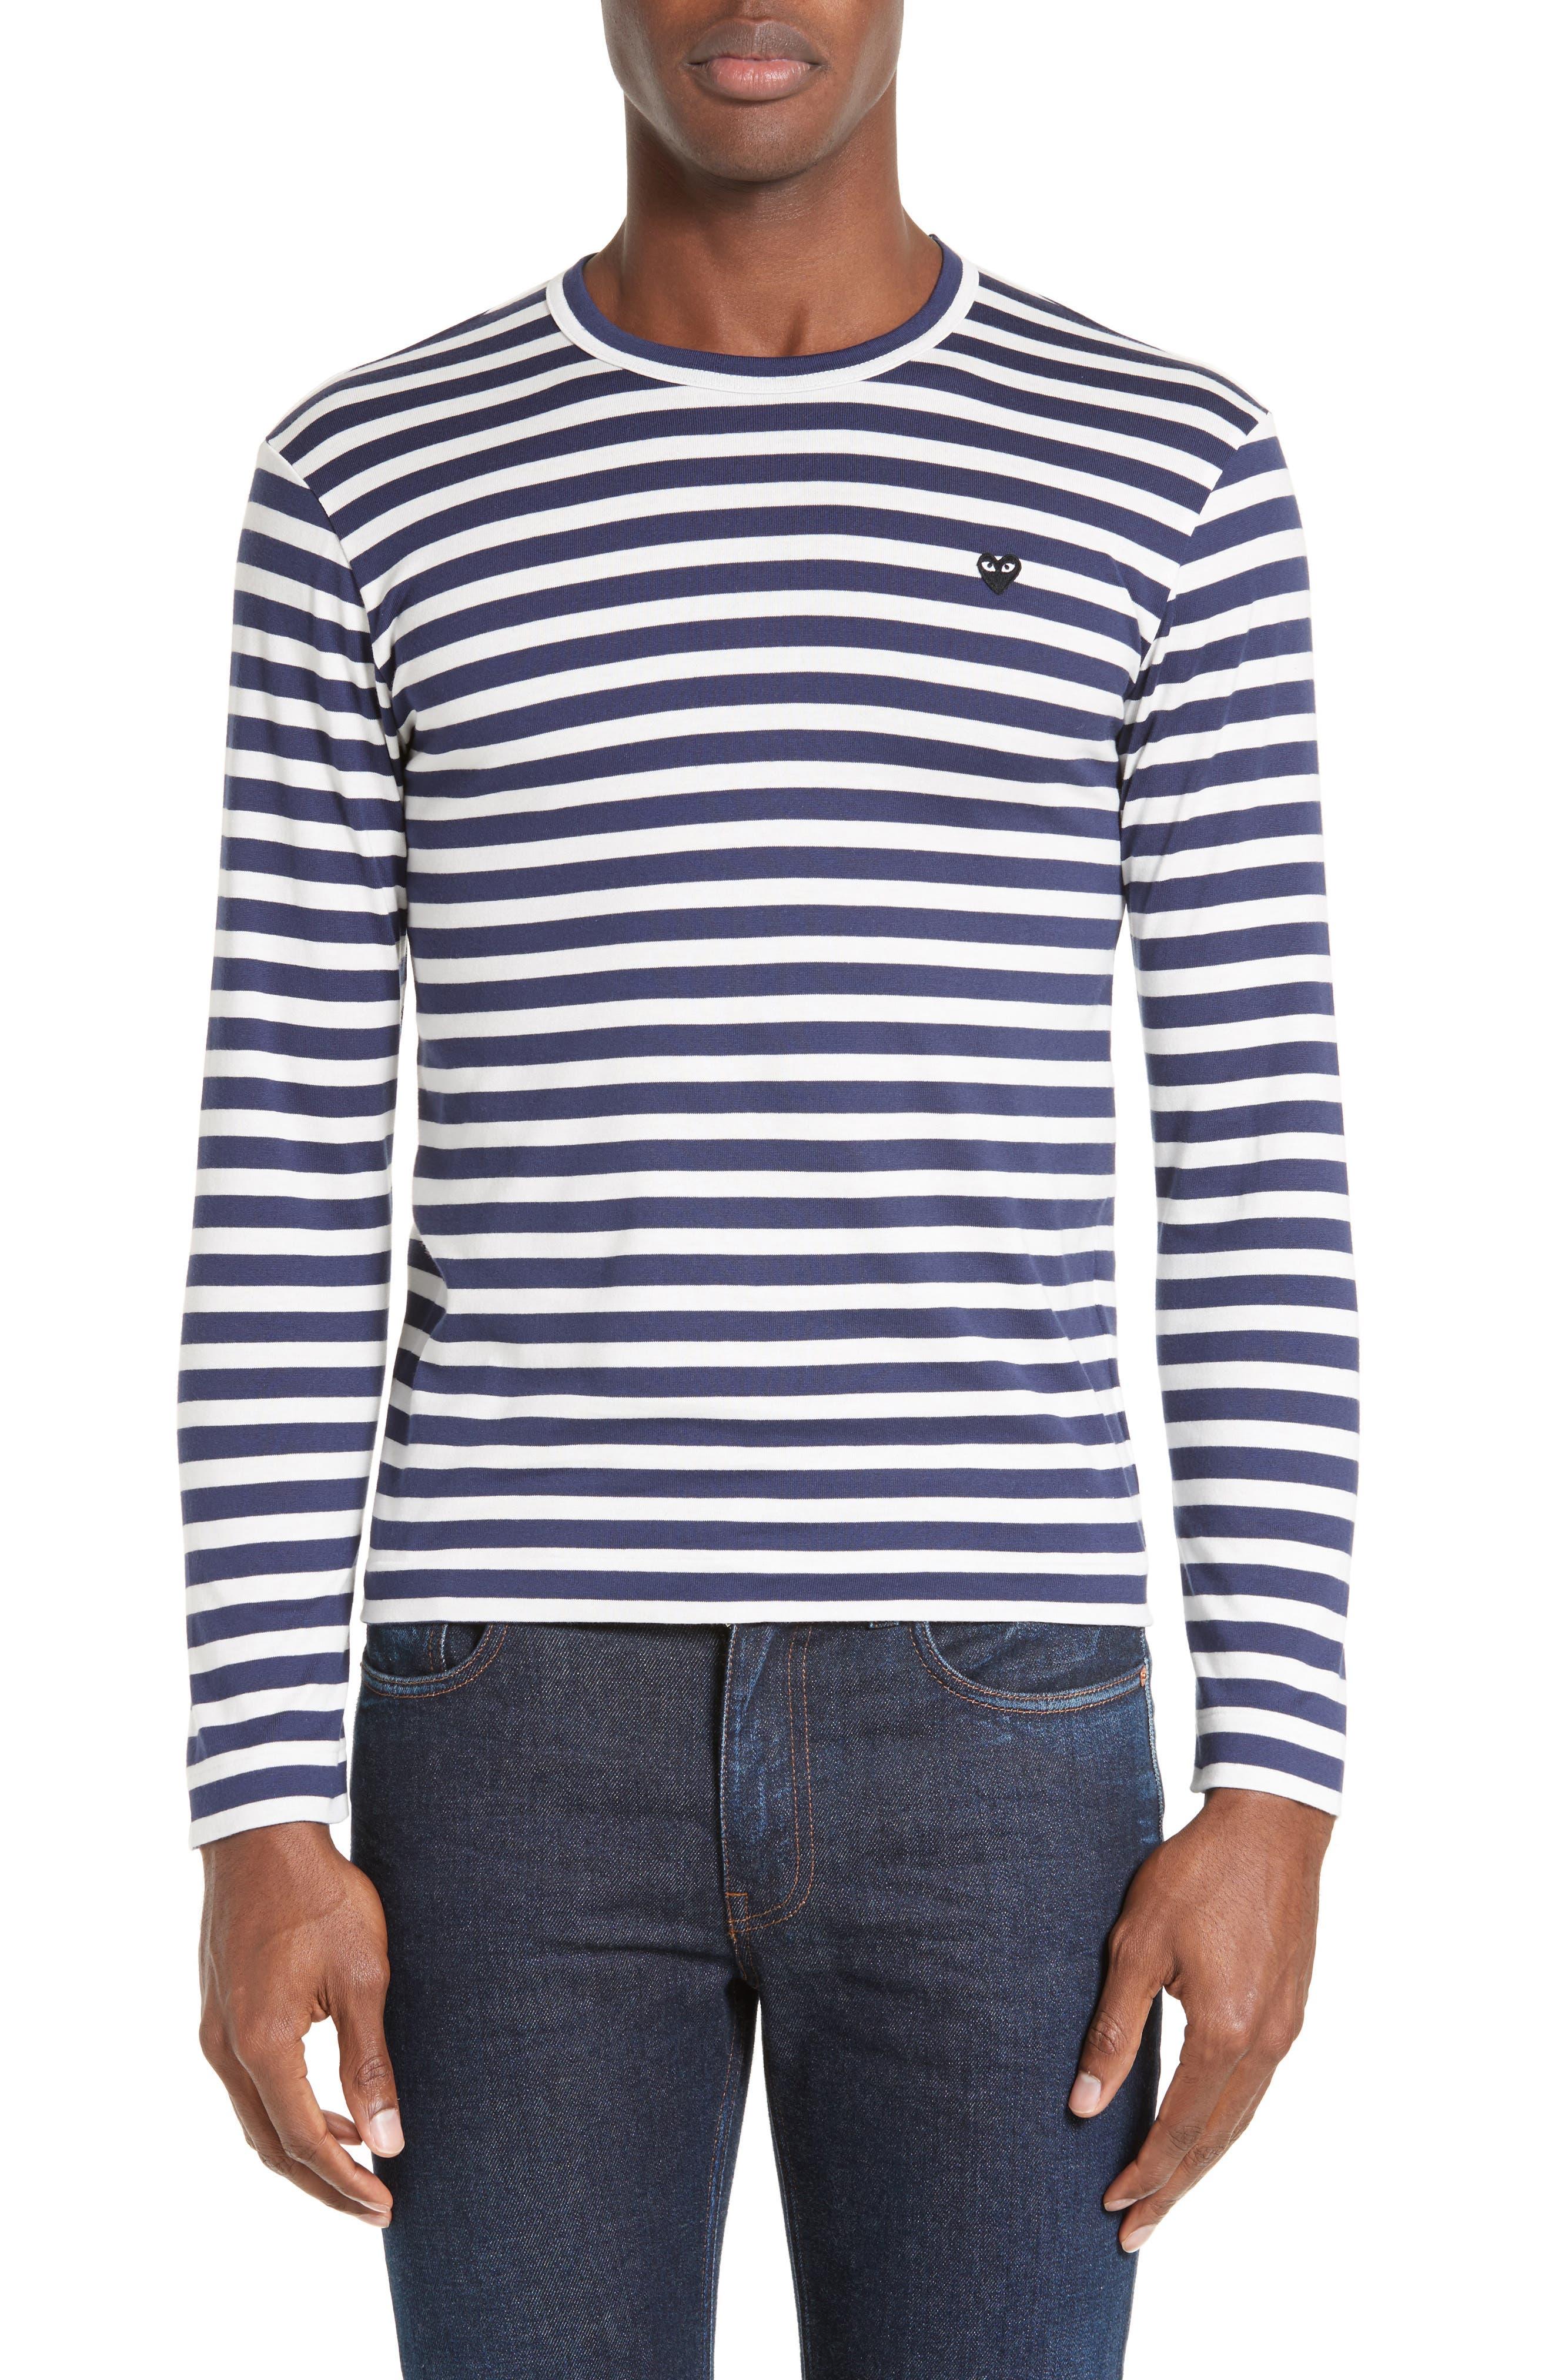 PLAY Stripe T-Shirt,                         Main,                         color,